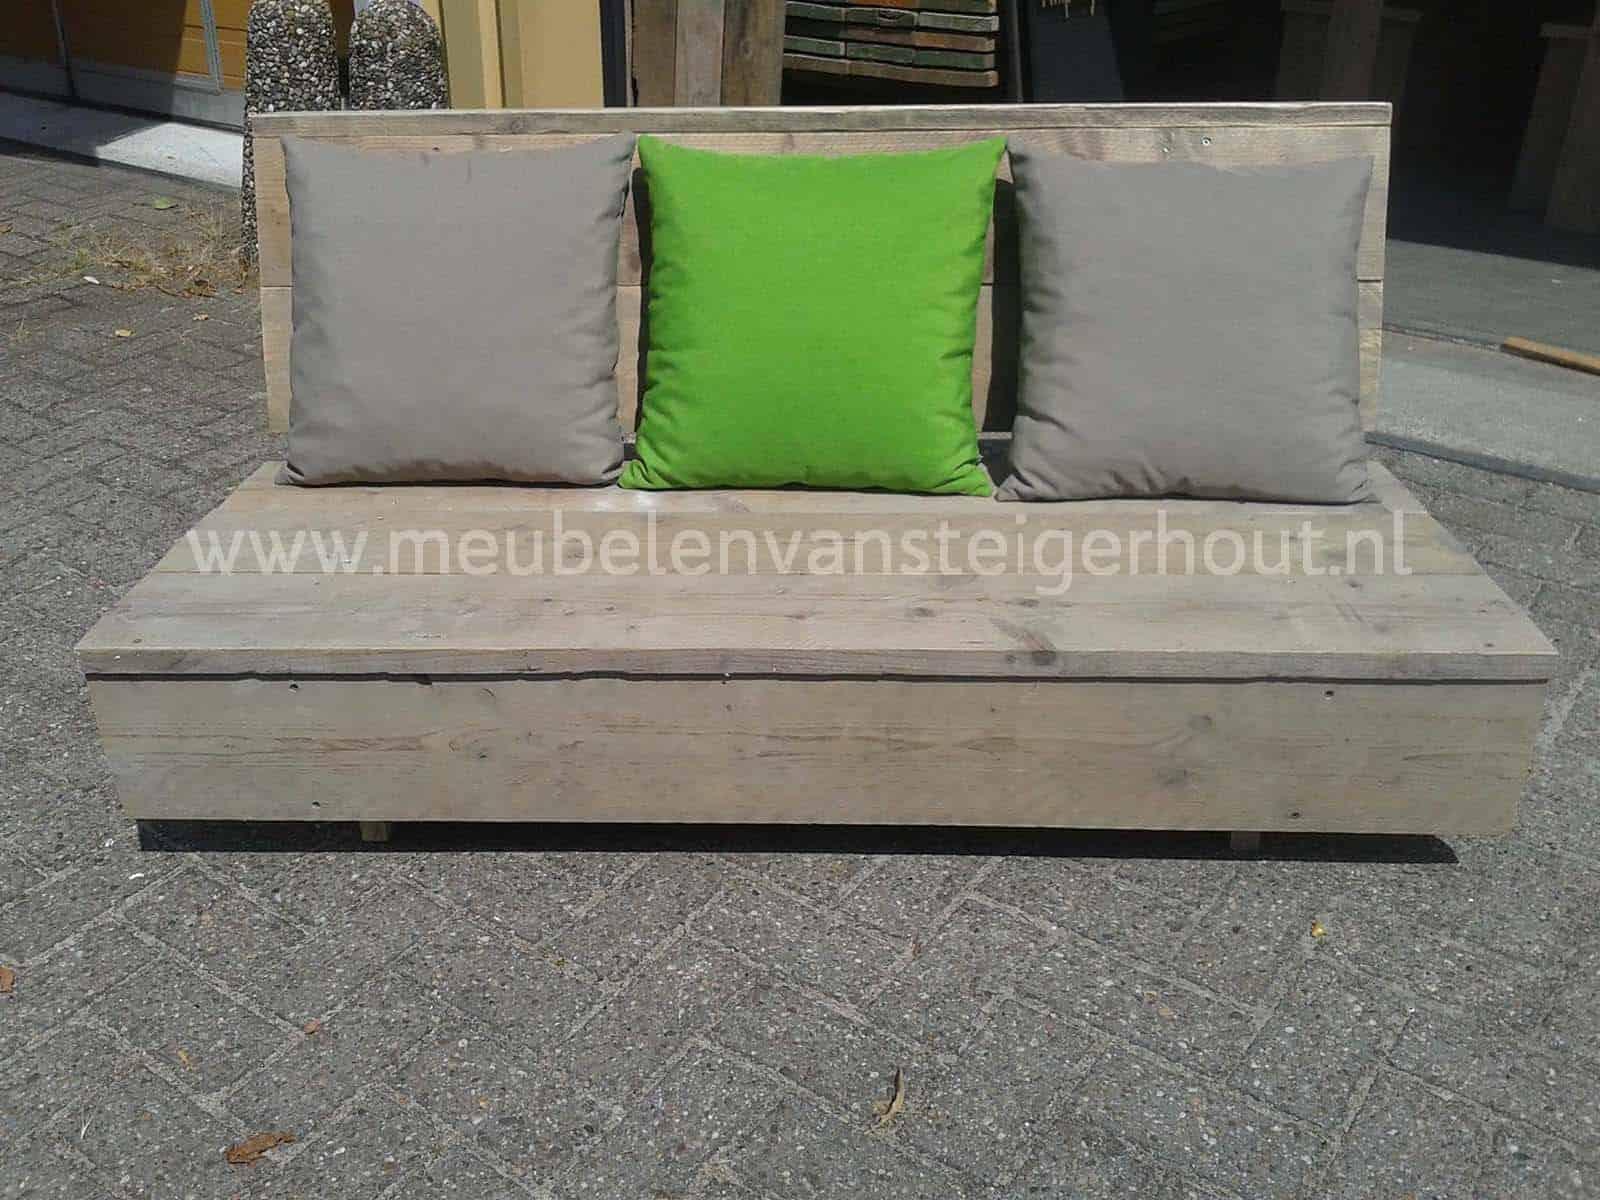 loungebank b smart 2 meubelen van steigerhout. Black Bedroom Furniture Sets. Home Design Ideas